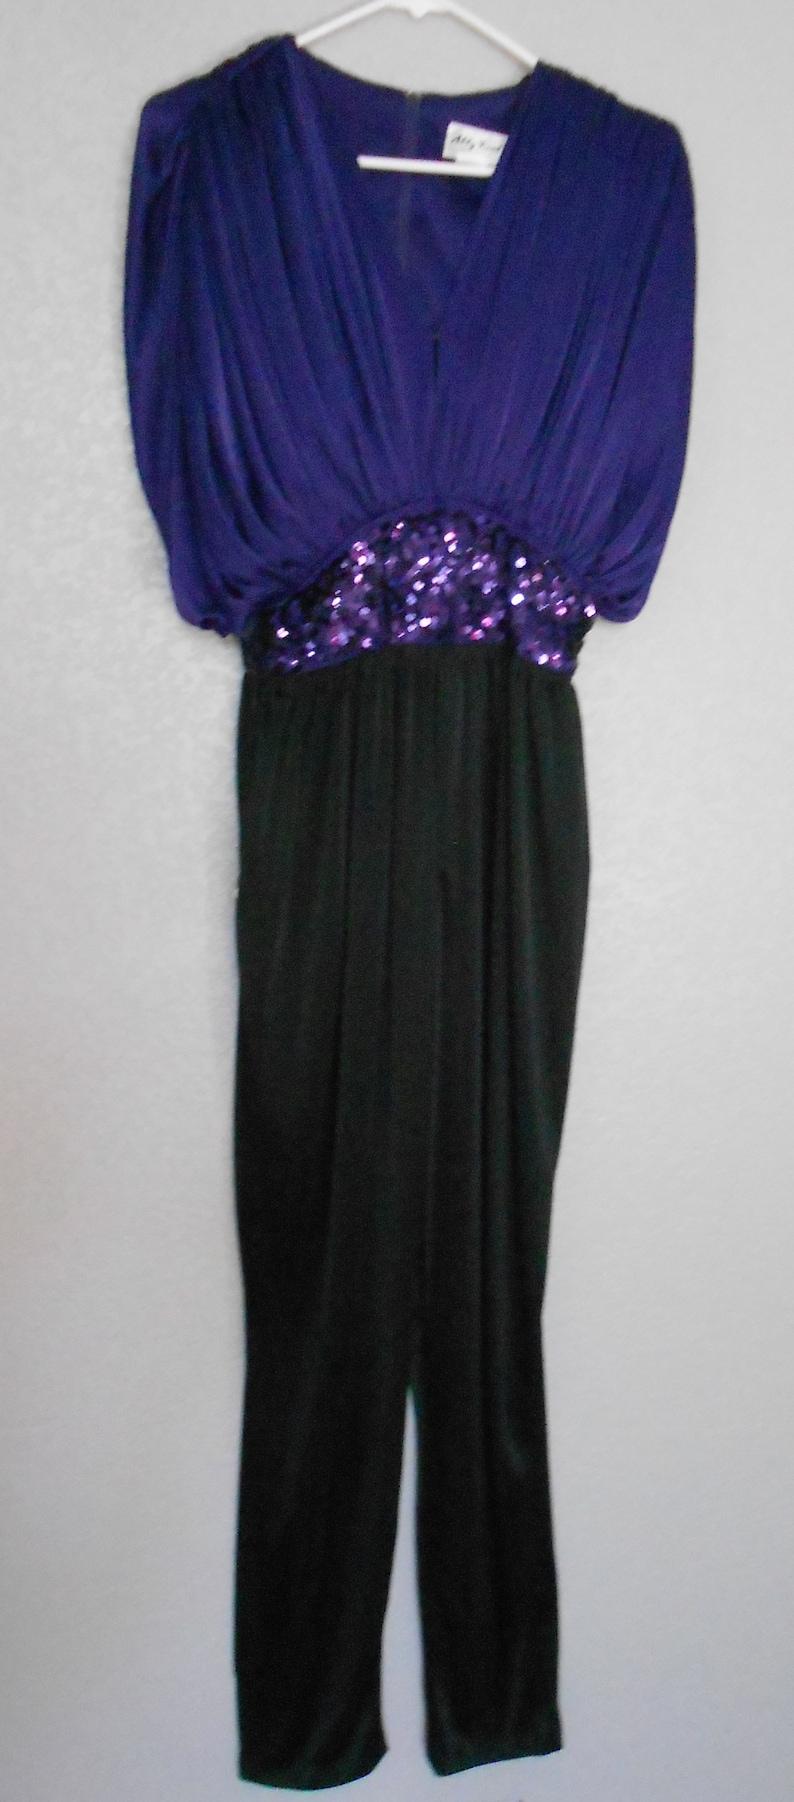 70c9c709e07b2d Abbey Kent Edwardian pants dress purple top black pants see